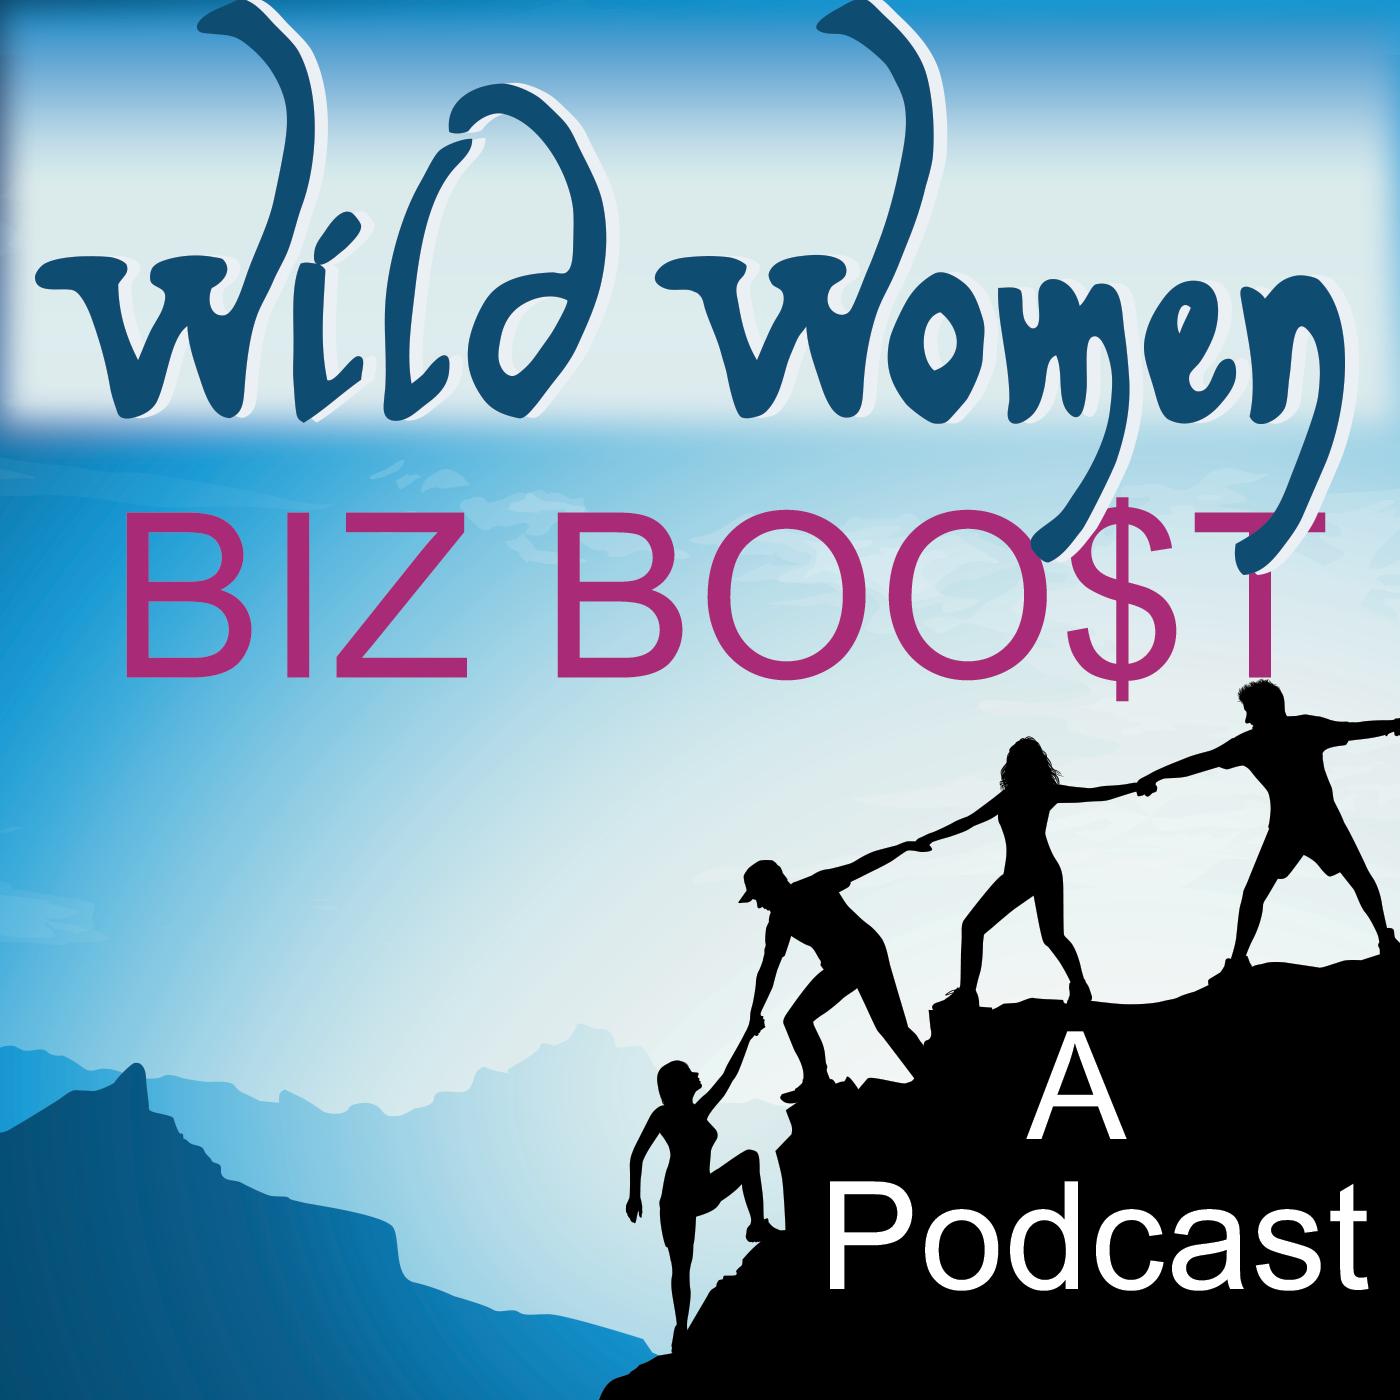 bizboost podcasts